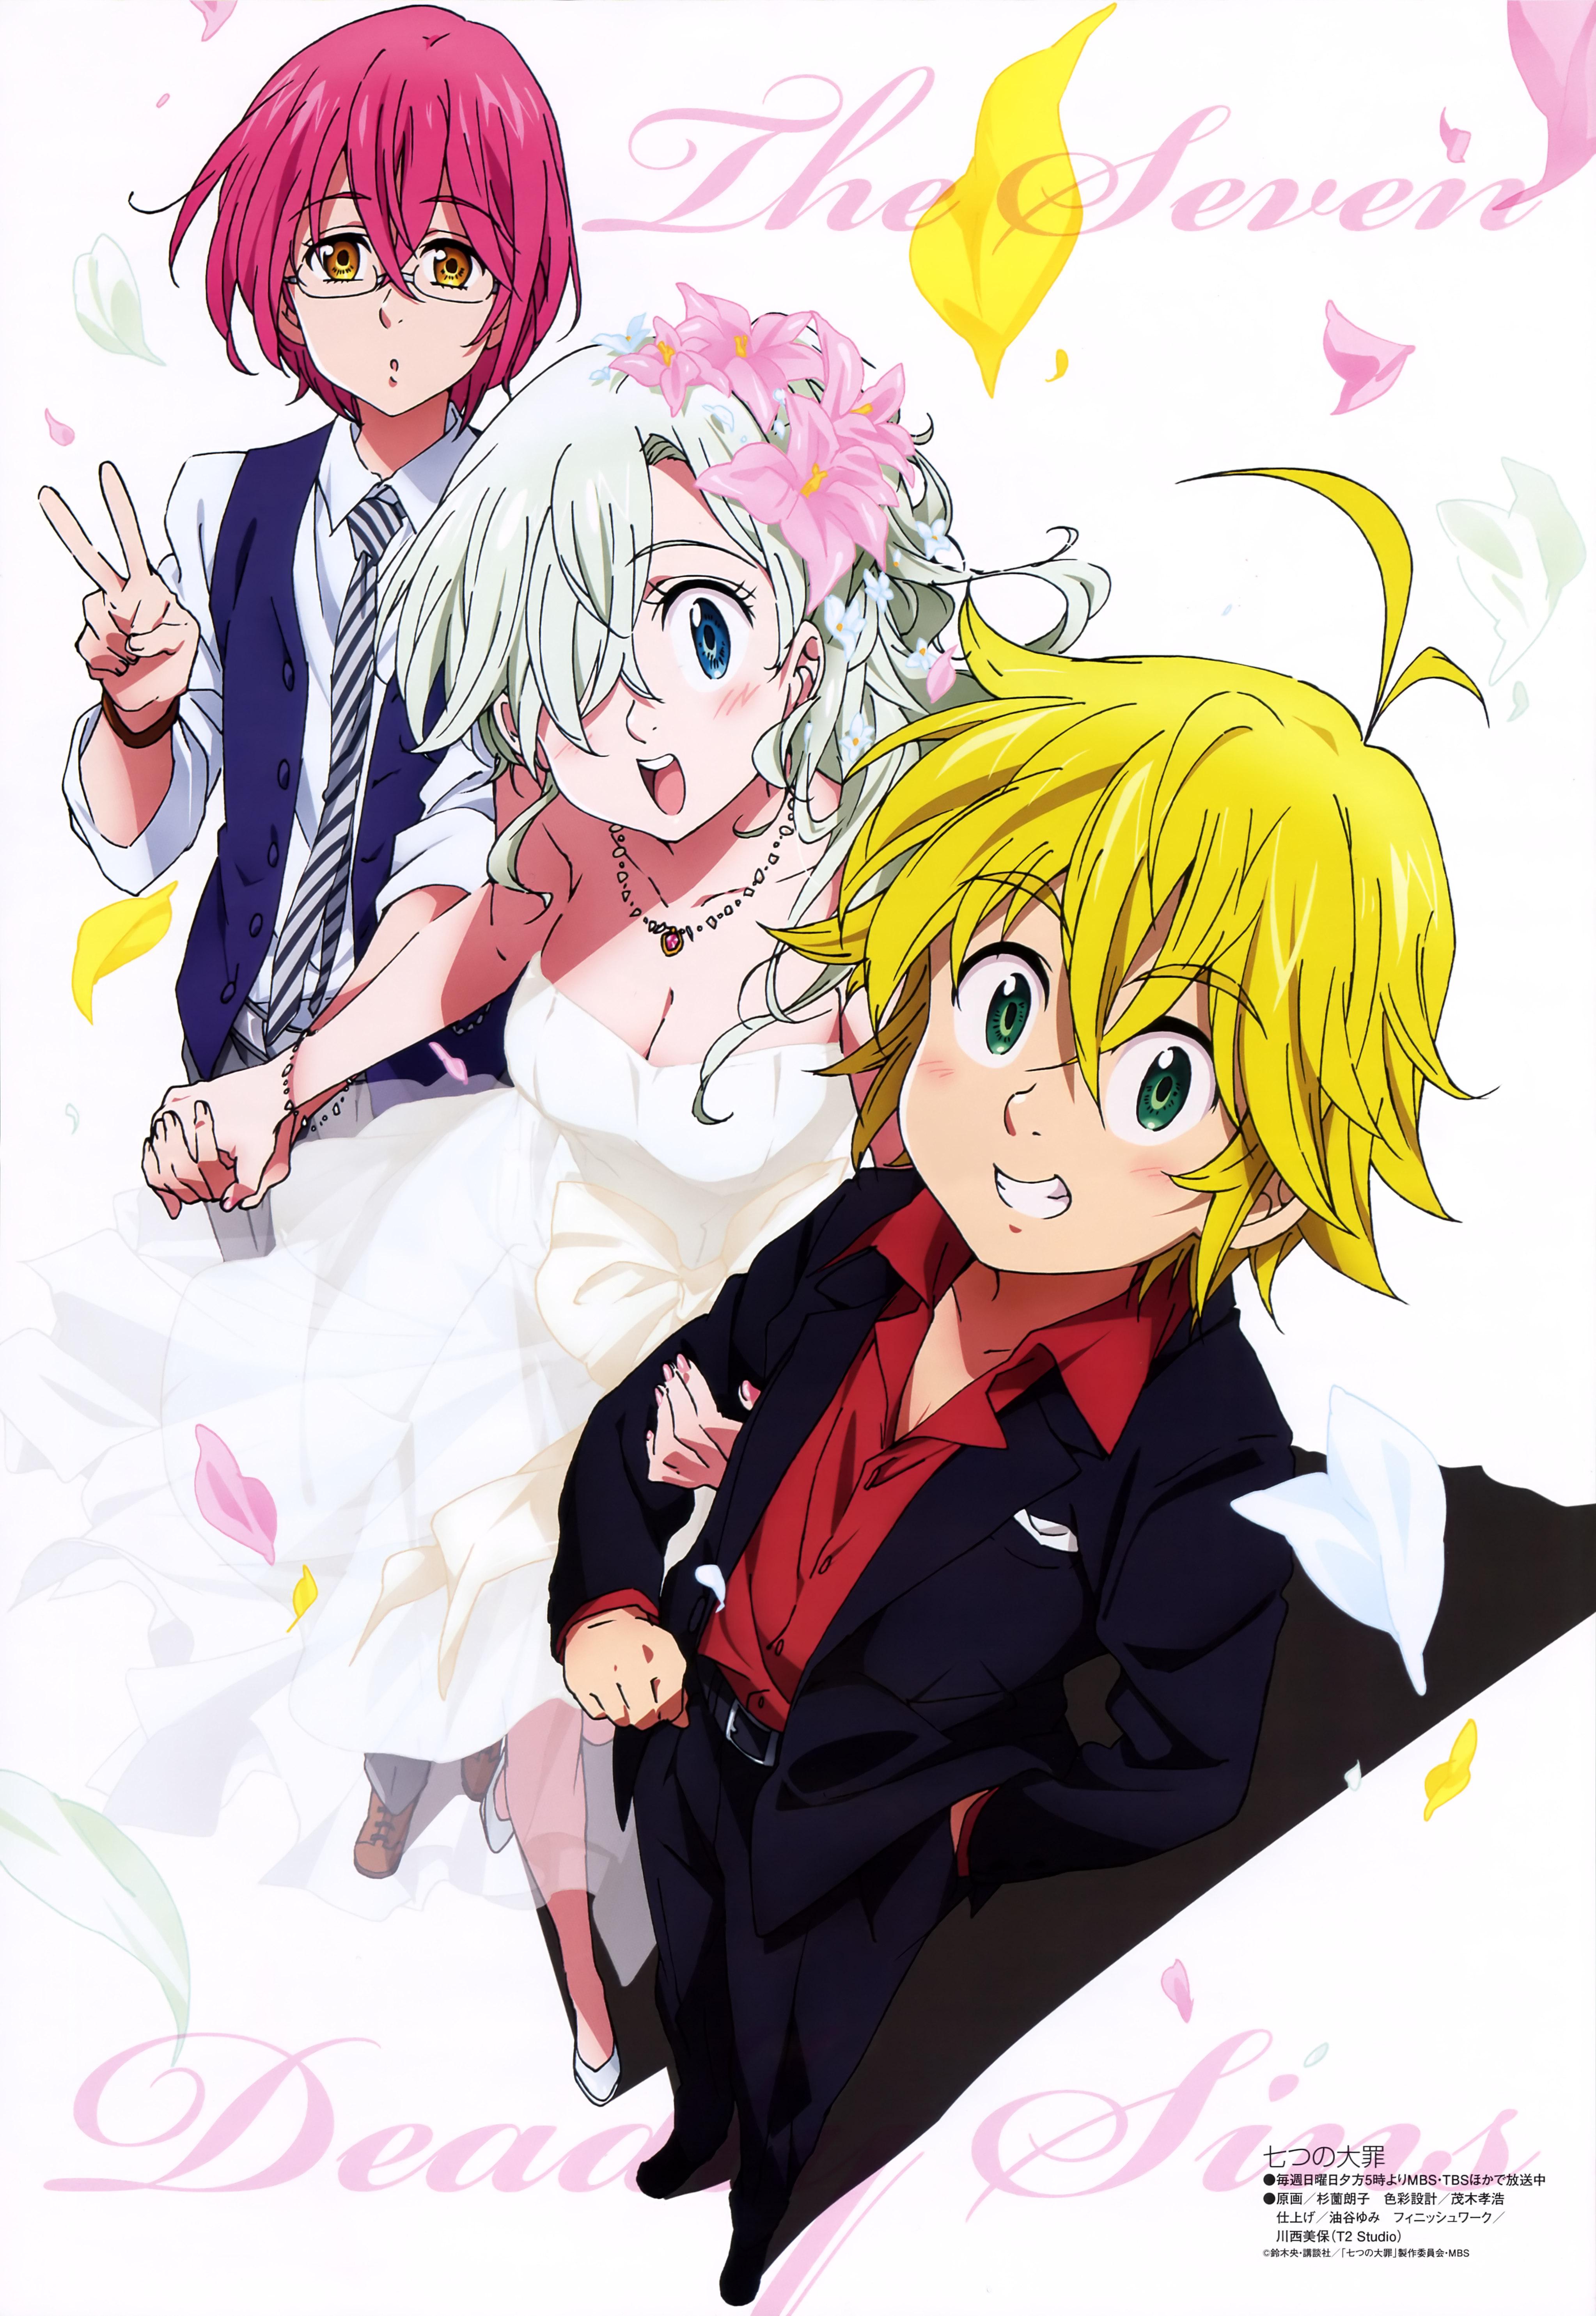 This Nanatsu no Taizai Poster Visual Has a Valentine Theme haruhichan.com The Seven Deadly Sins